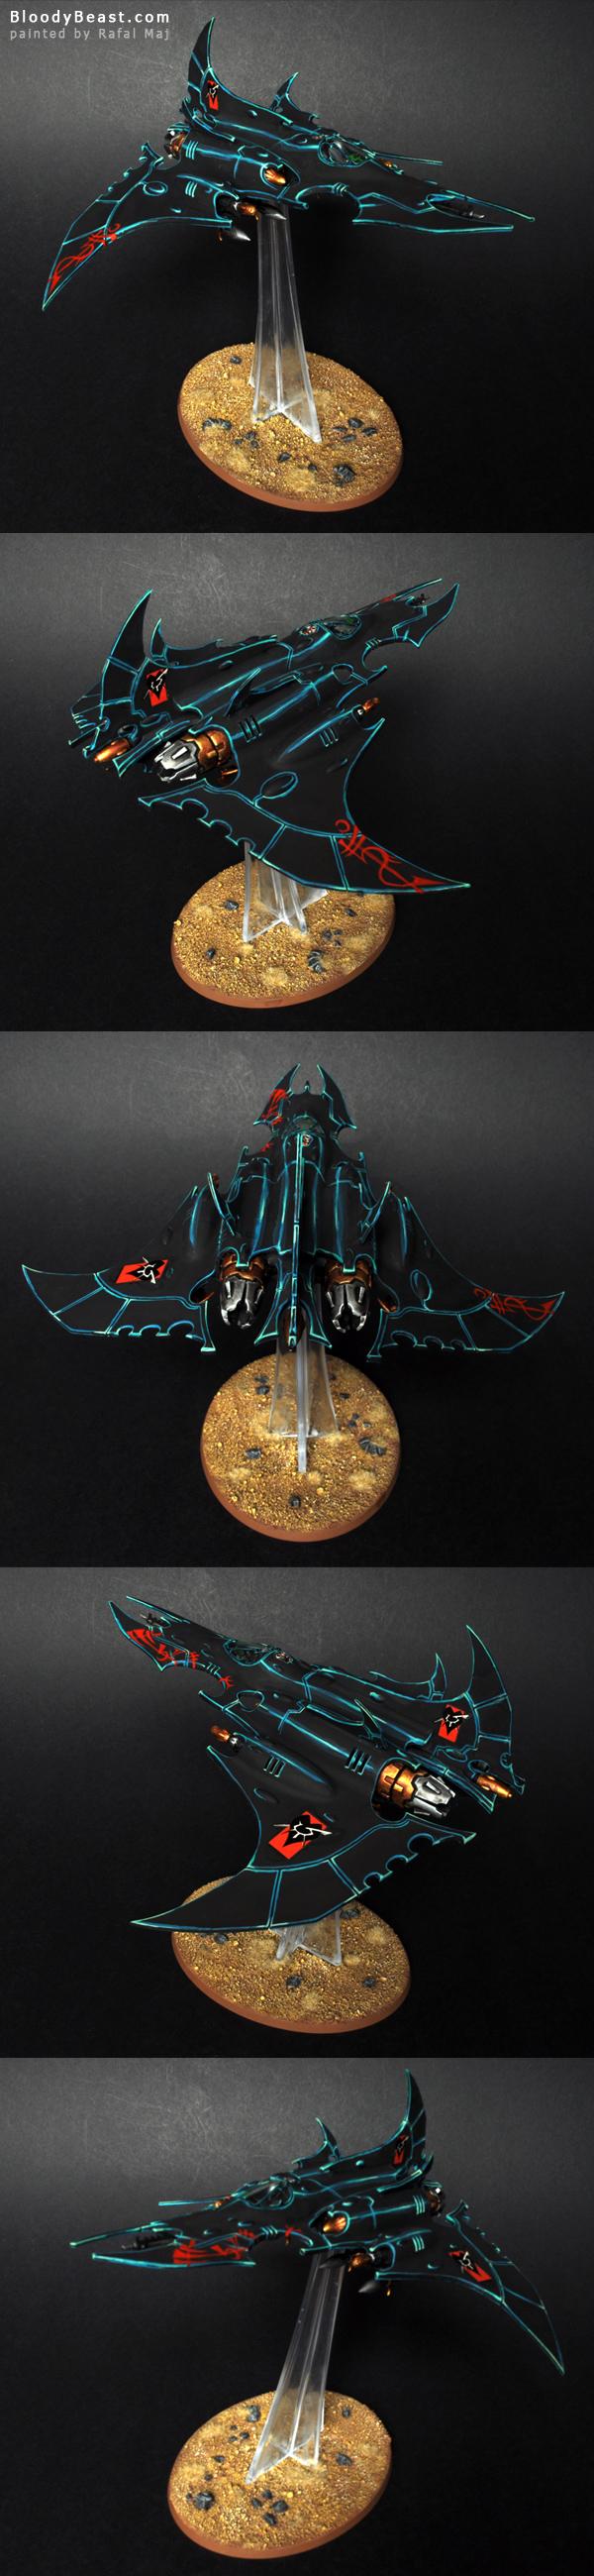 Dark Eldar Razorwing Jetfighter painted by Rafal Maj (BloodyBeast.com)